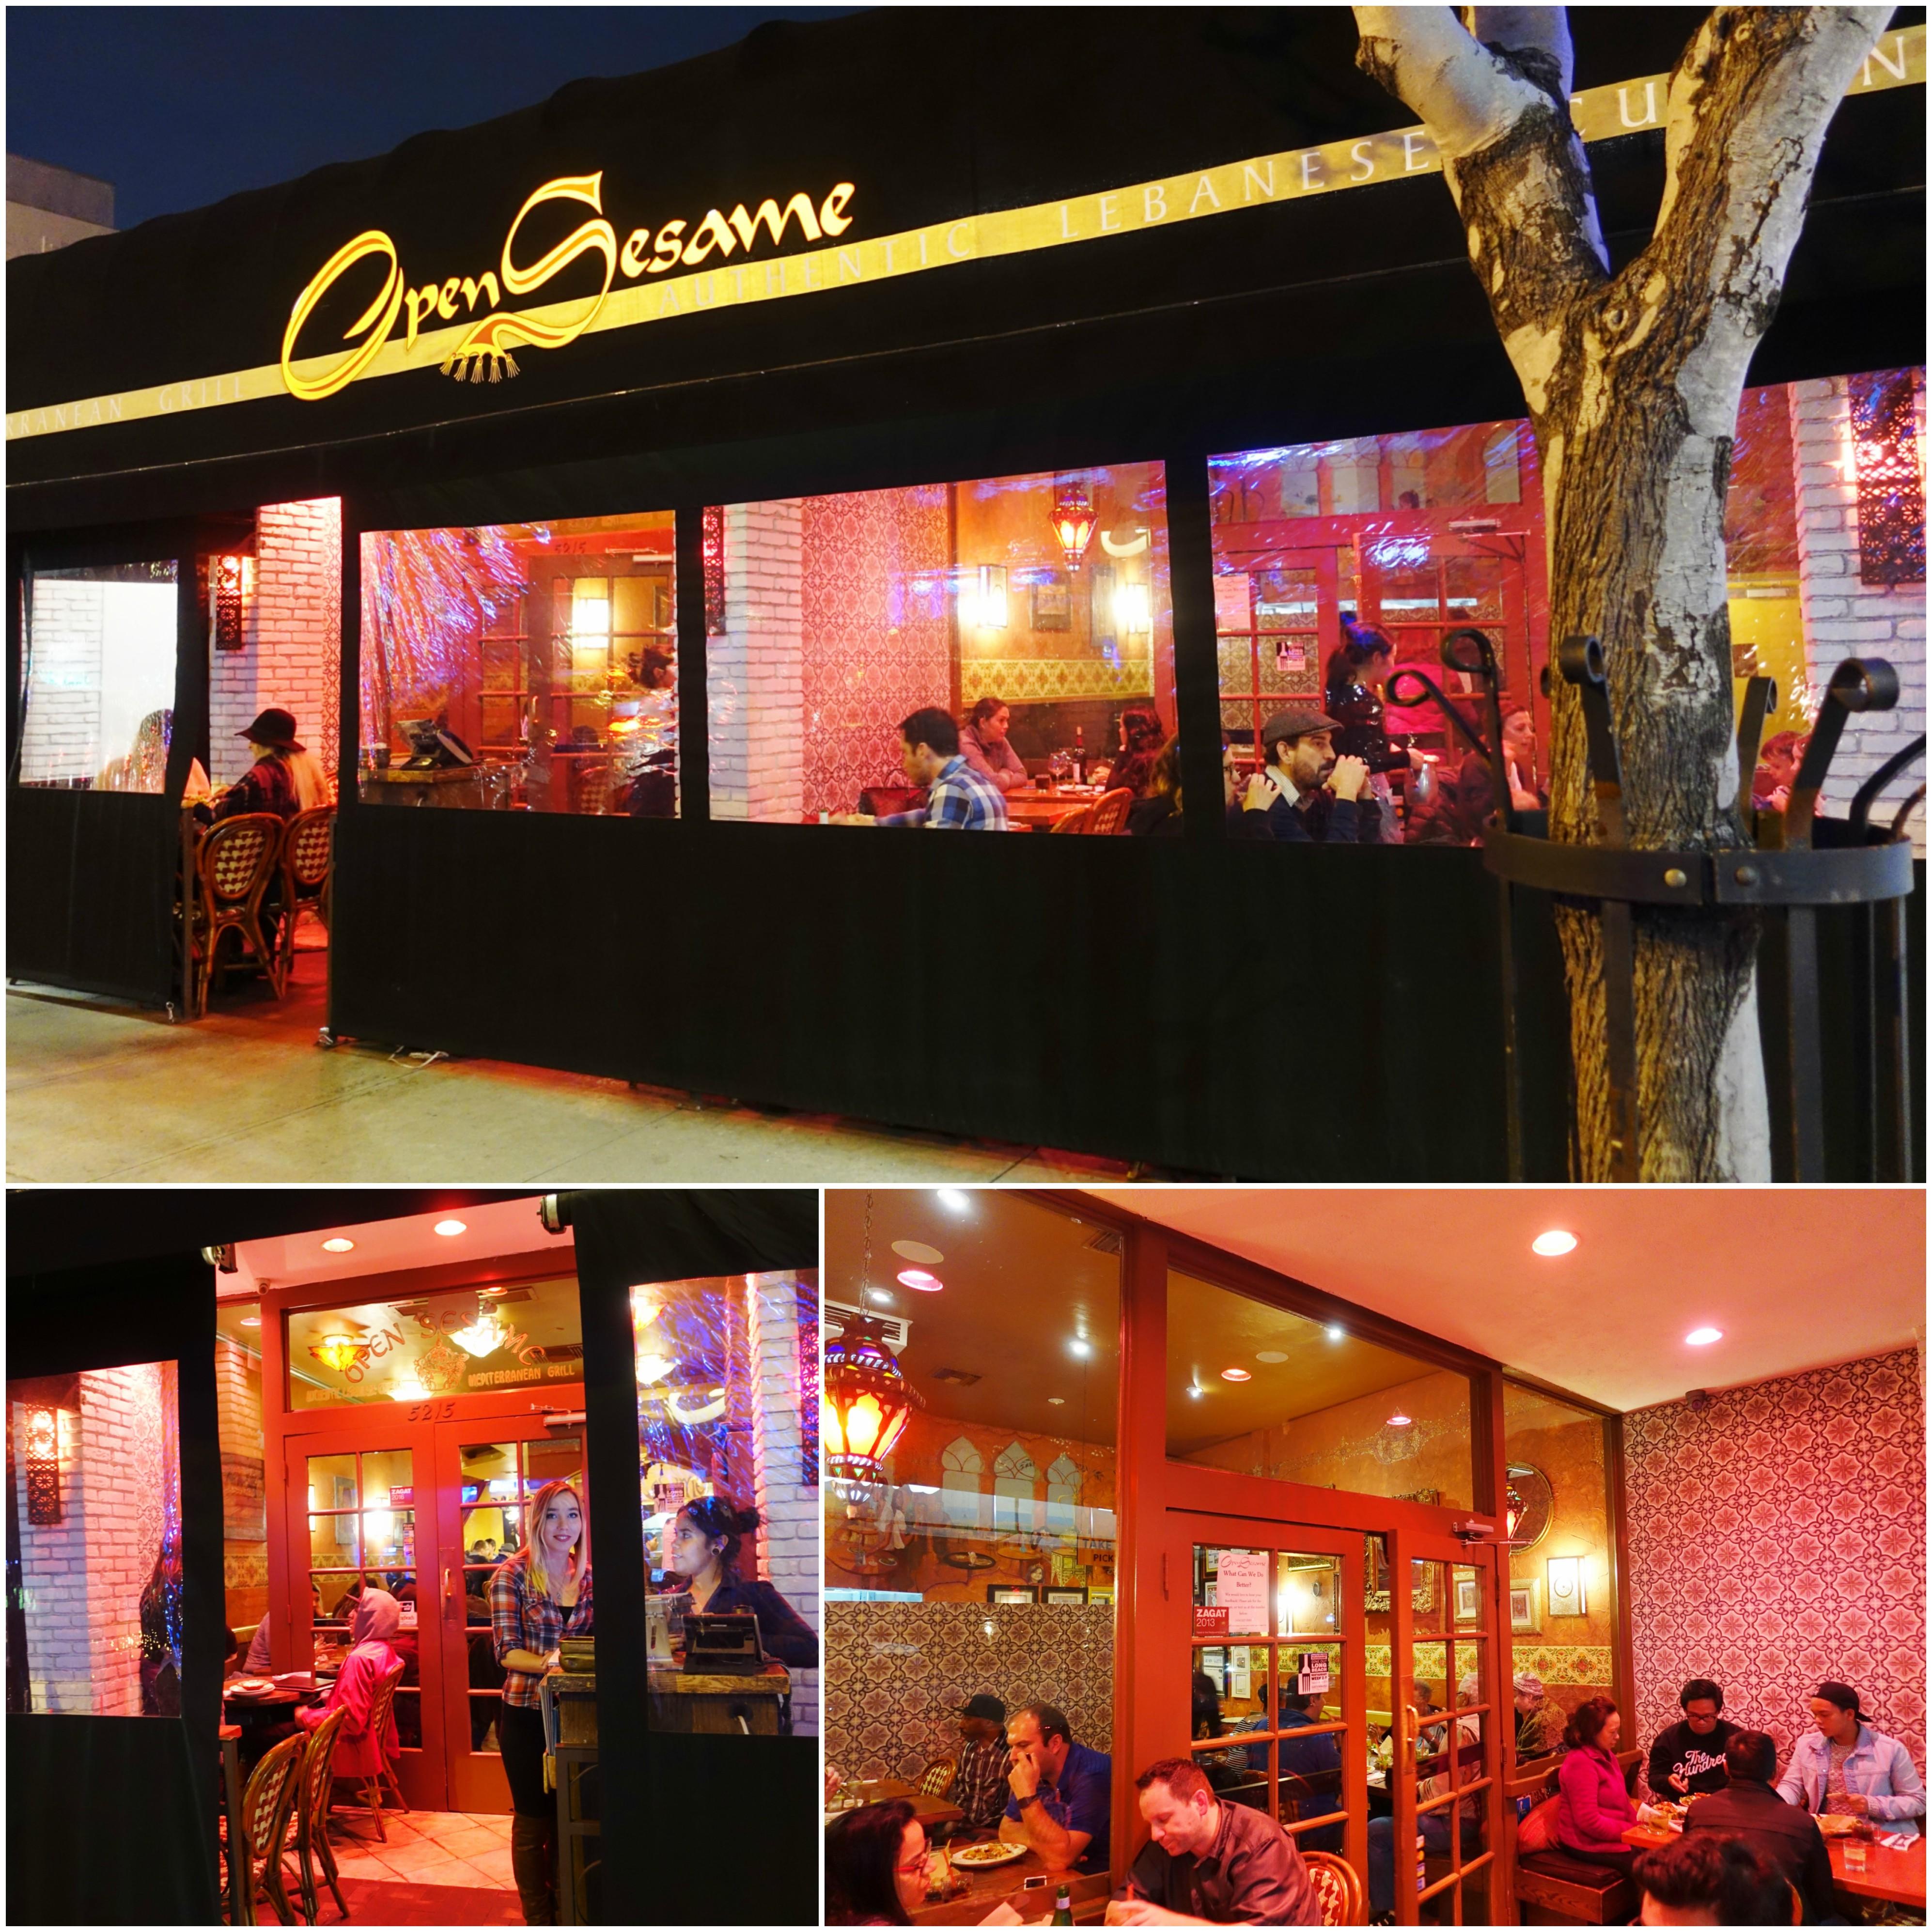 Open Sesame - Long Beach, California1